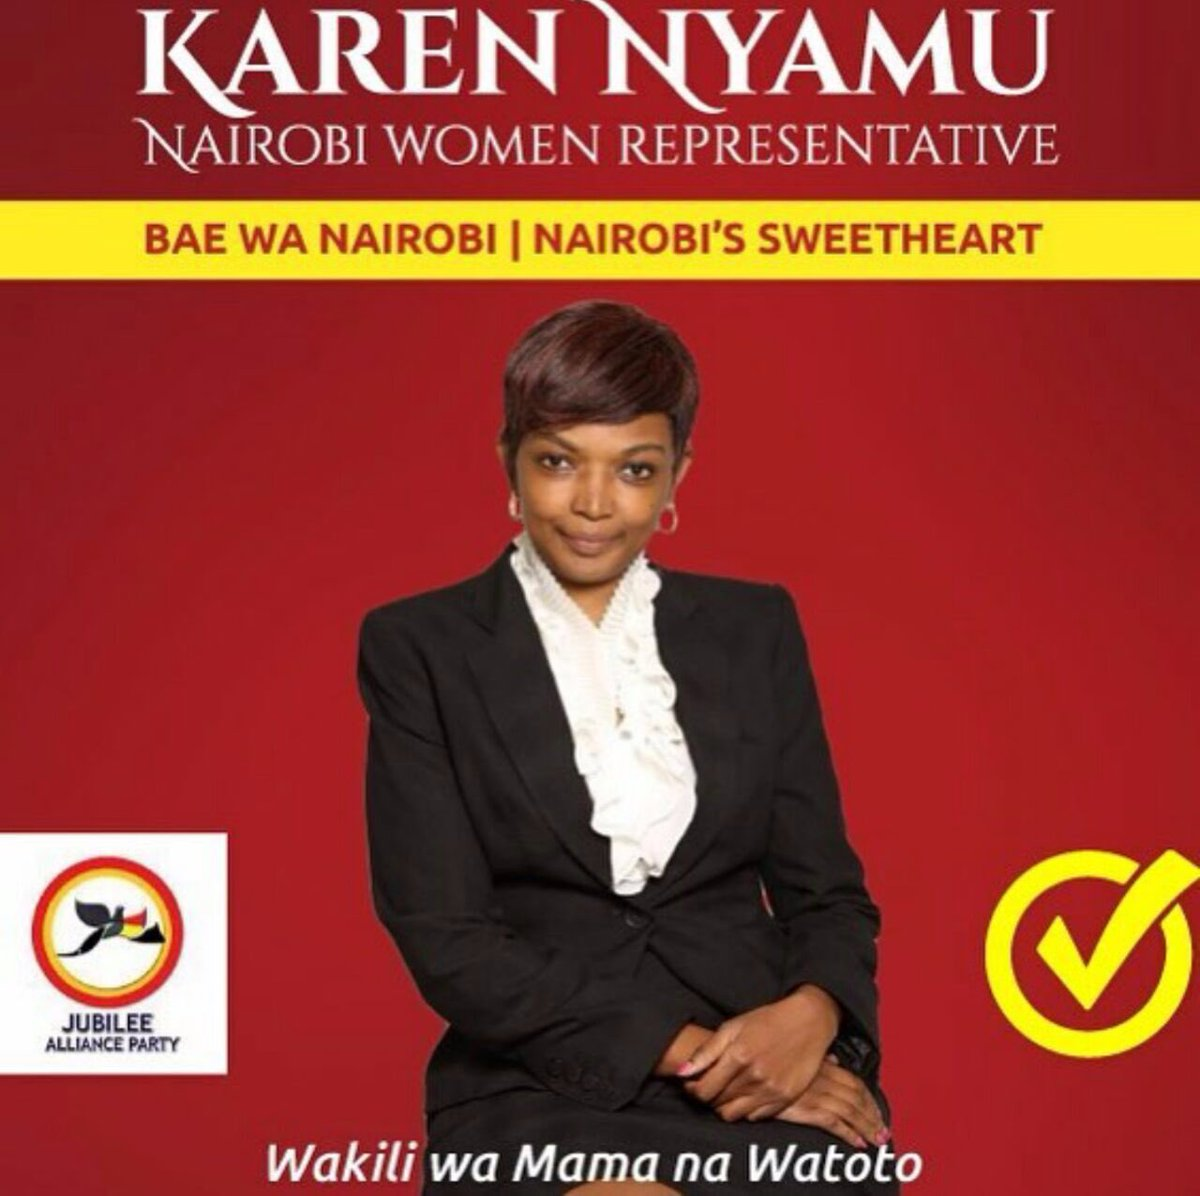 Image result for karen nyamu pictures